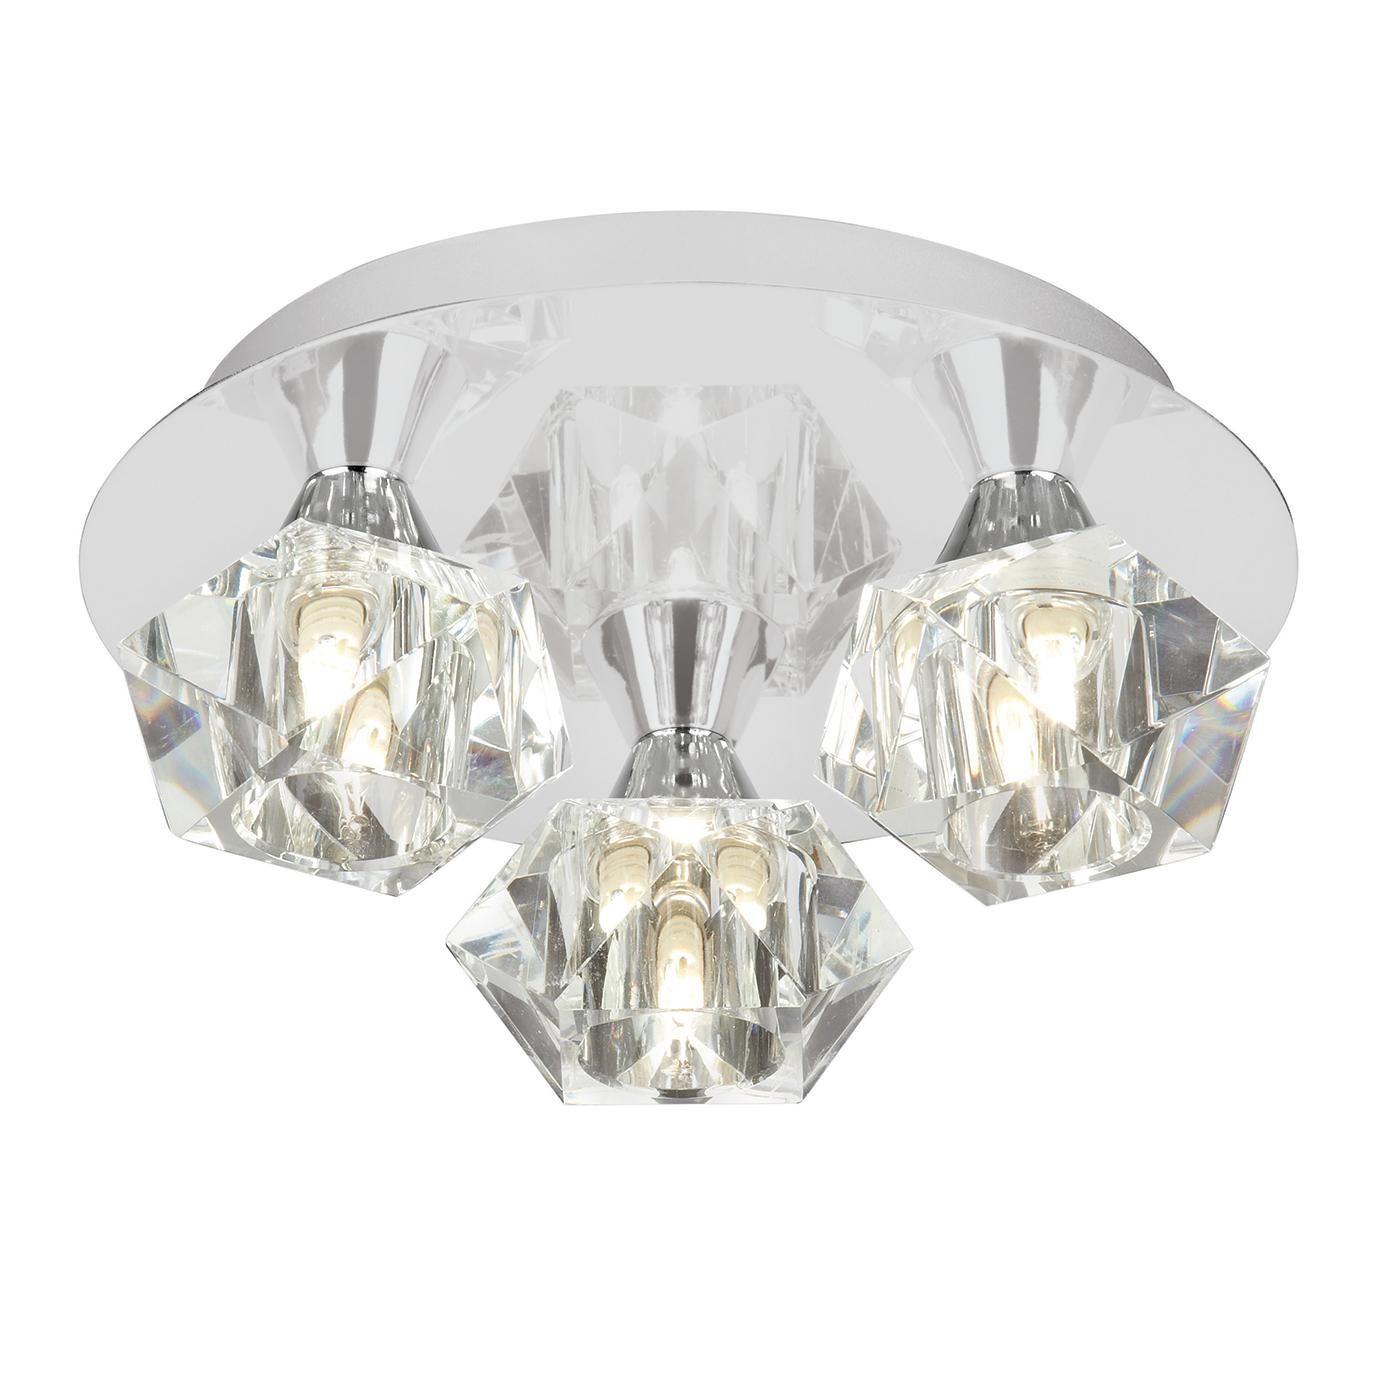 Endon ARIETTA-3PCH Ceiling Light 3x40W